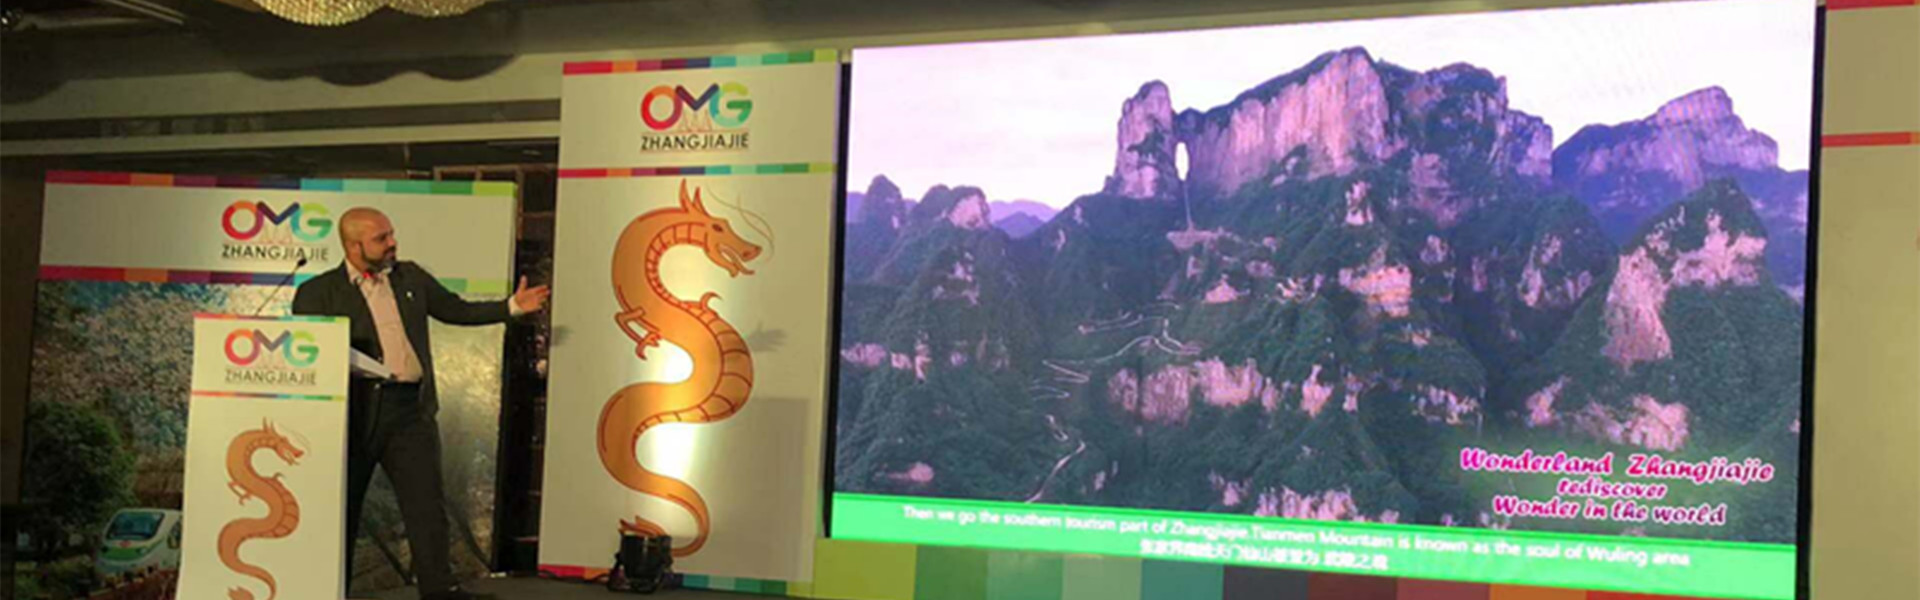 Zhangjiajie to promote tourism in Indian market